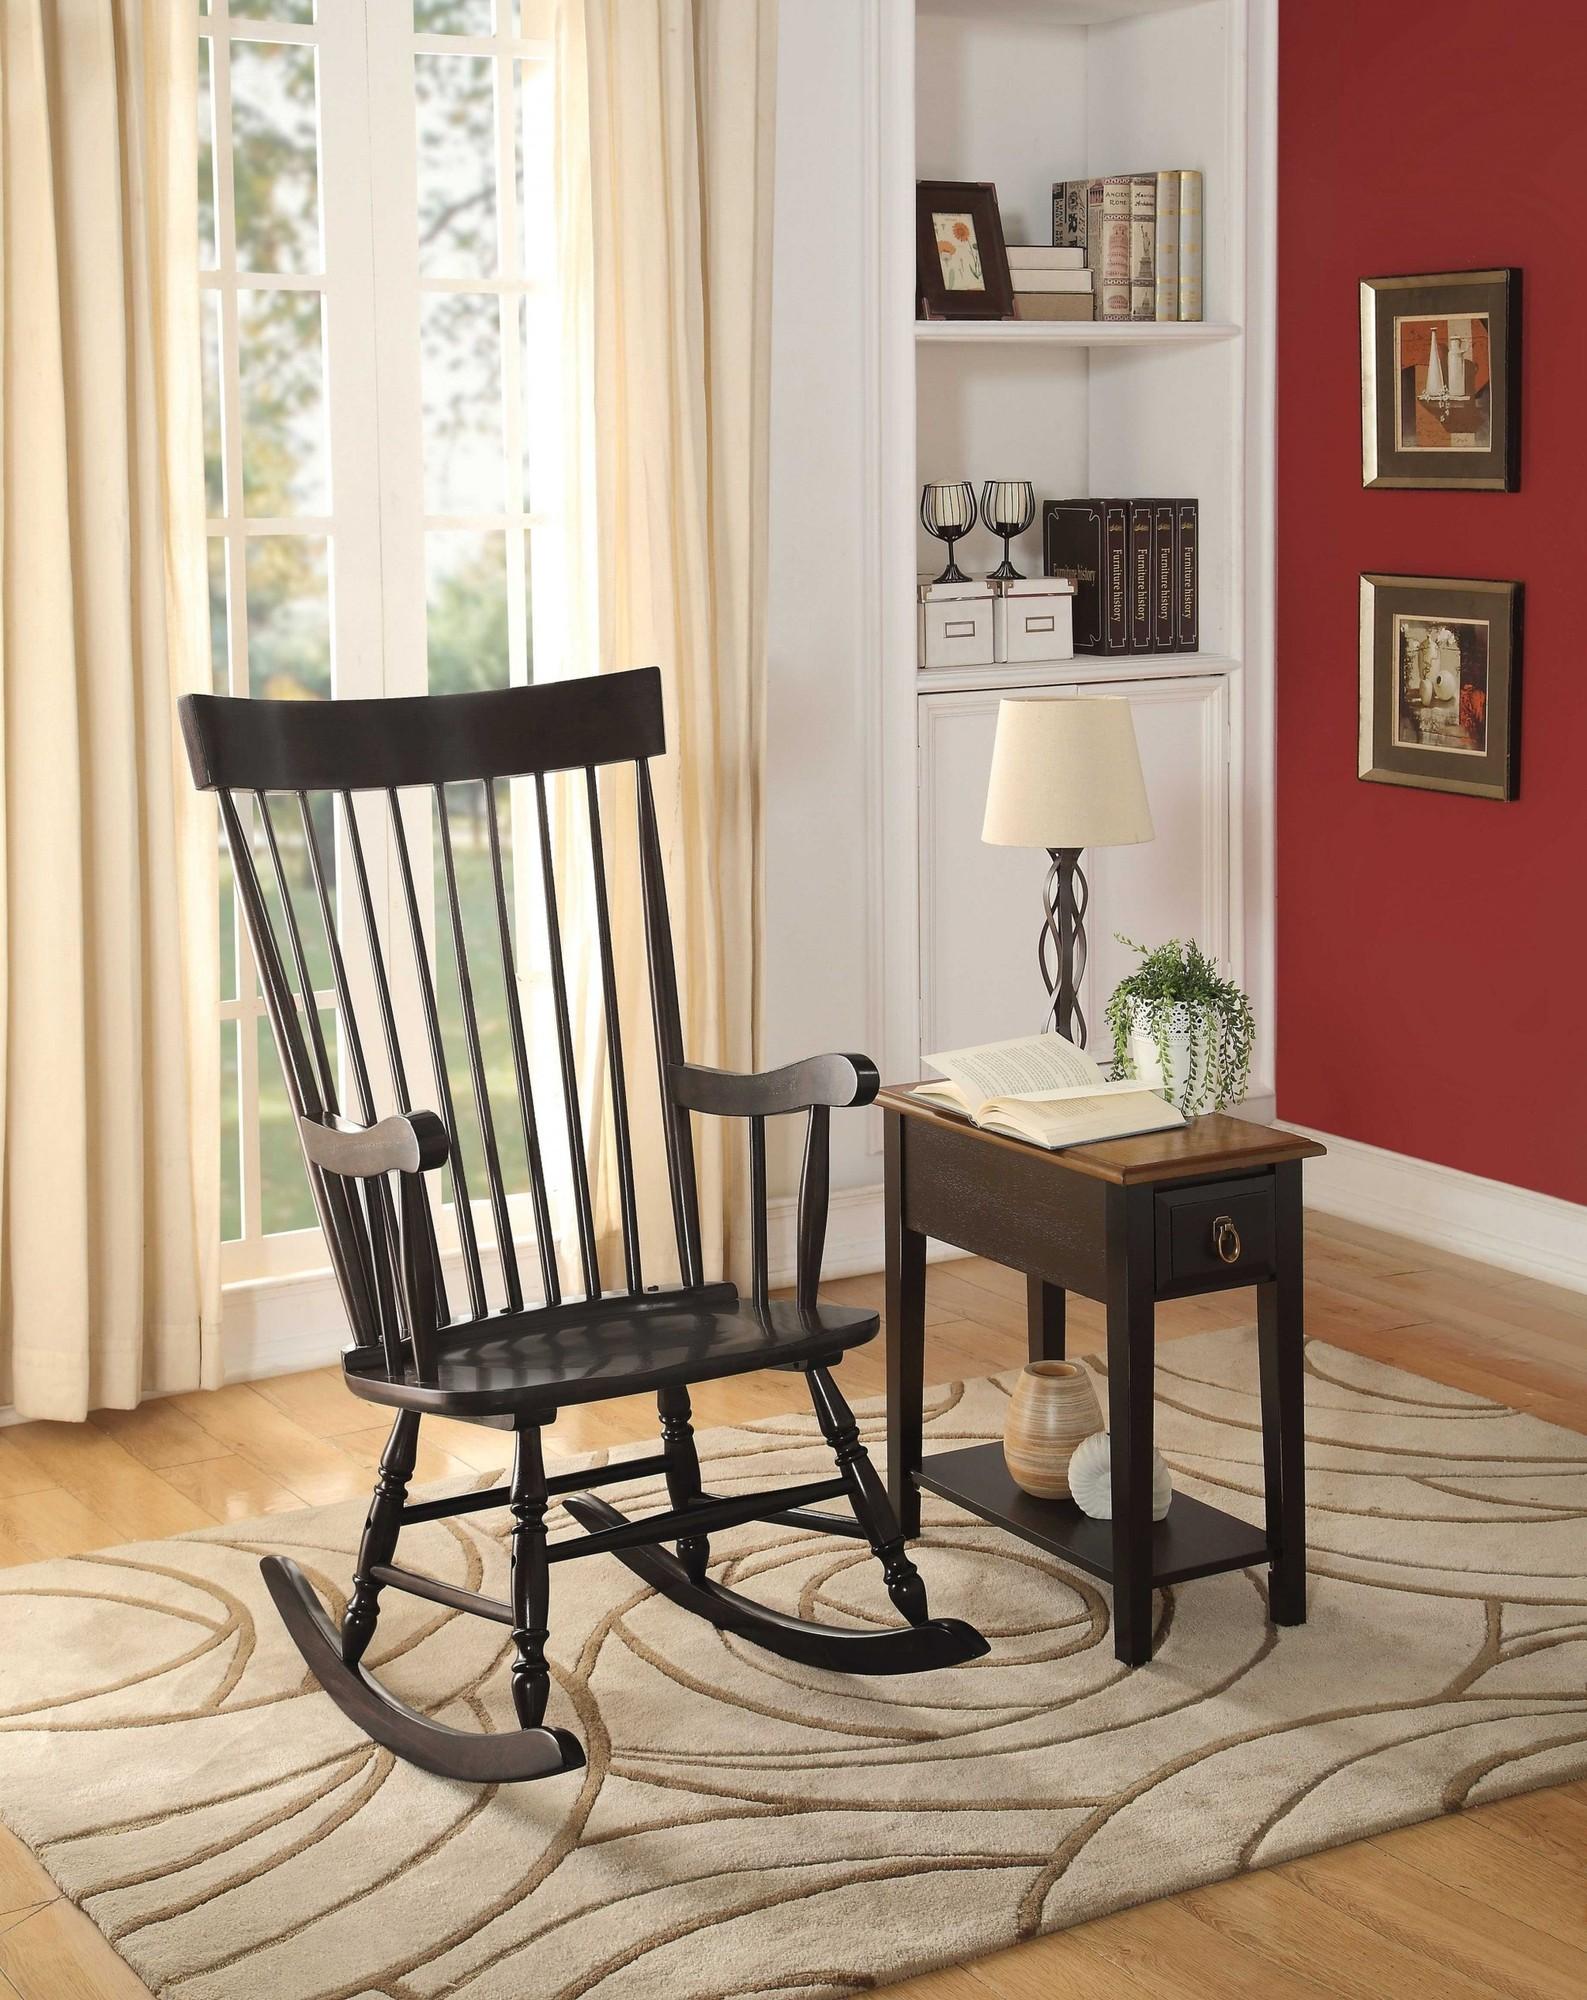 "33"" X 25"" X 45"" Black Wood Rocking Chair"